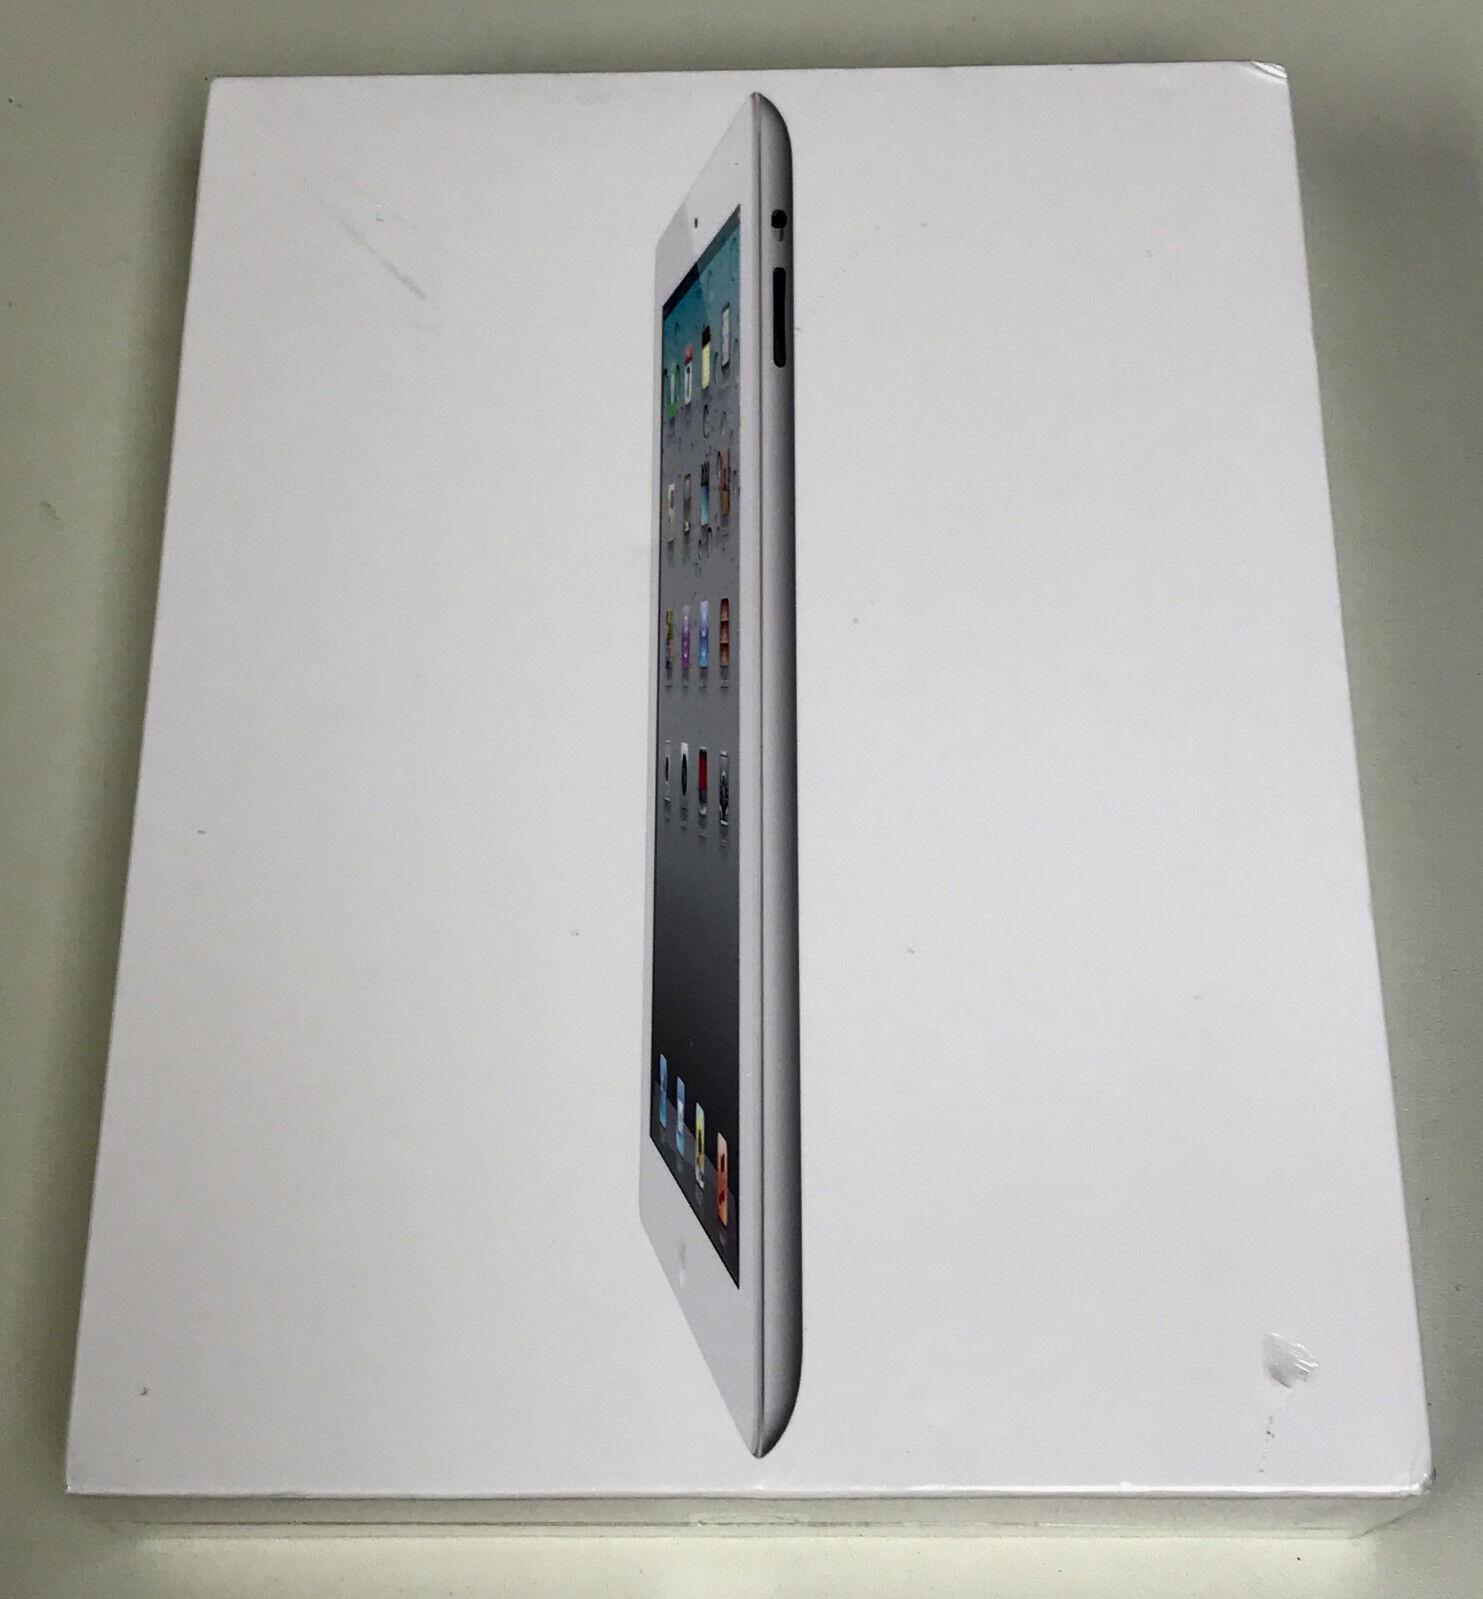 NEW Sealed Apple iPad 2 16GB WiFi White MC979LL/A A1395 iOS